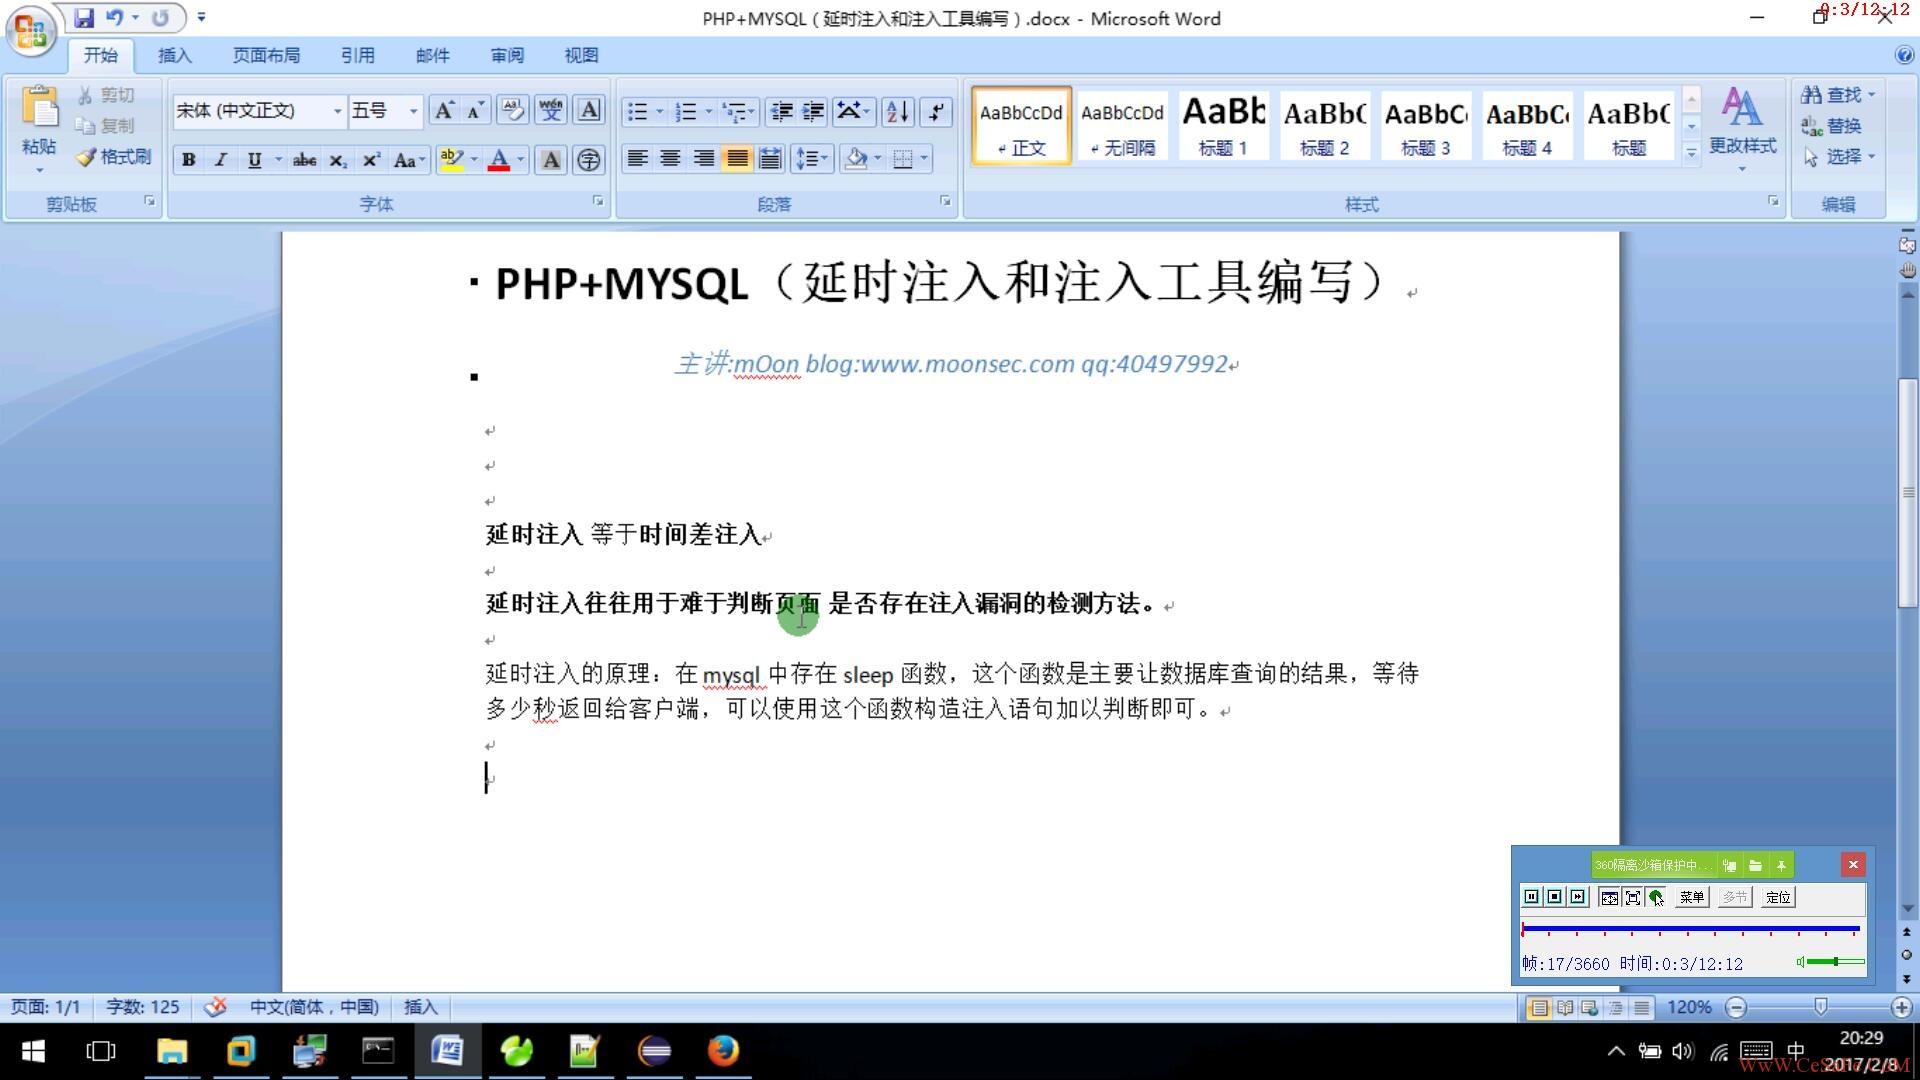 PHP+MYSQL(延时注入和注入工具编写)(视频教程含工具)